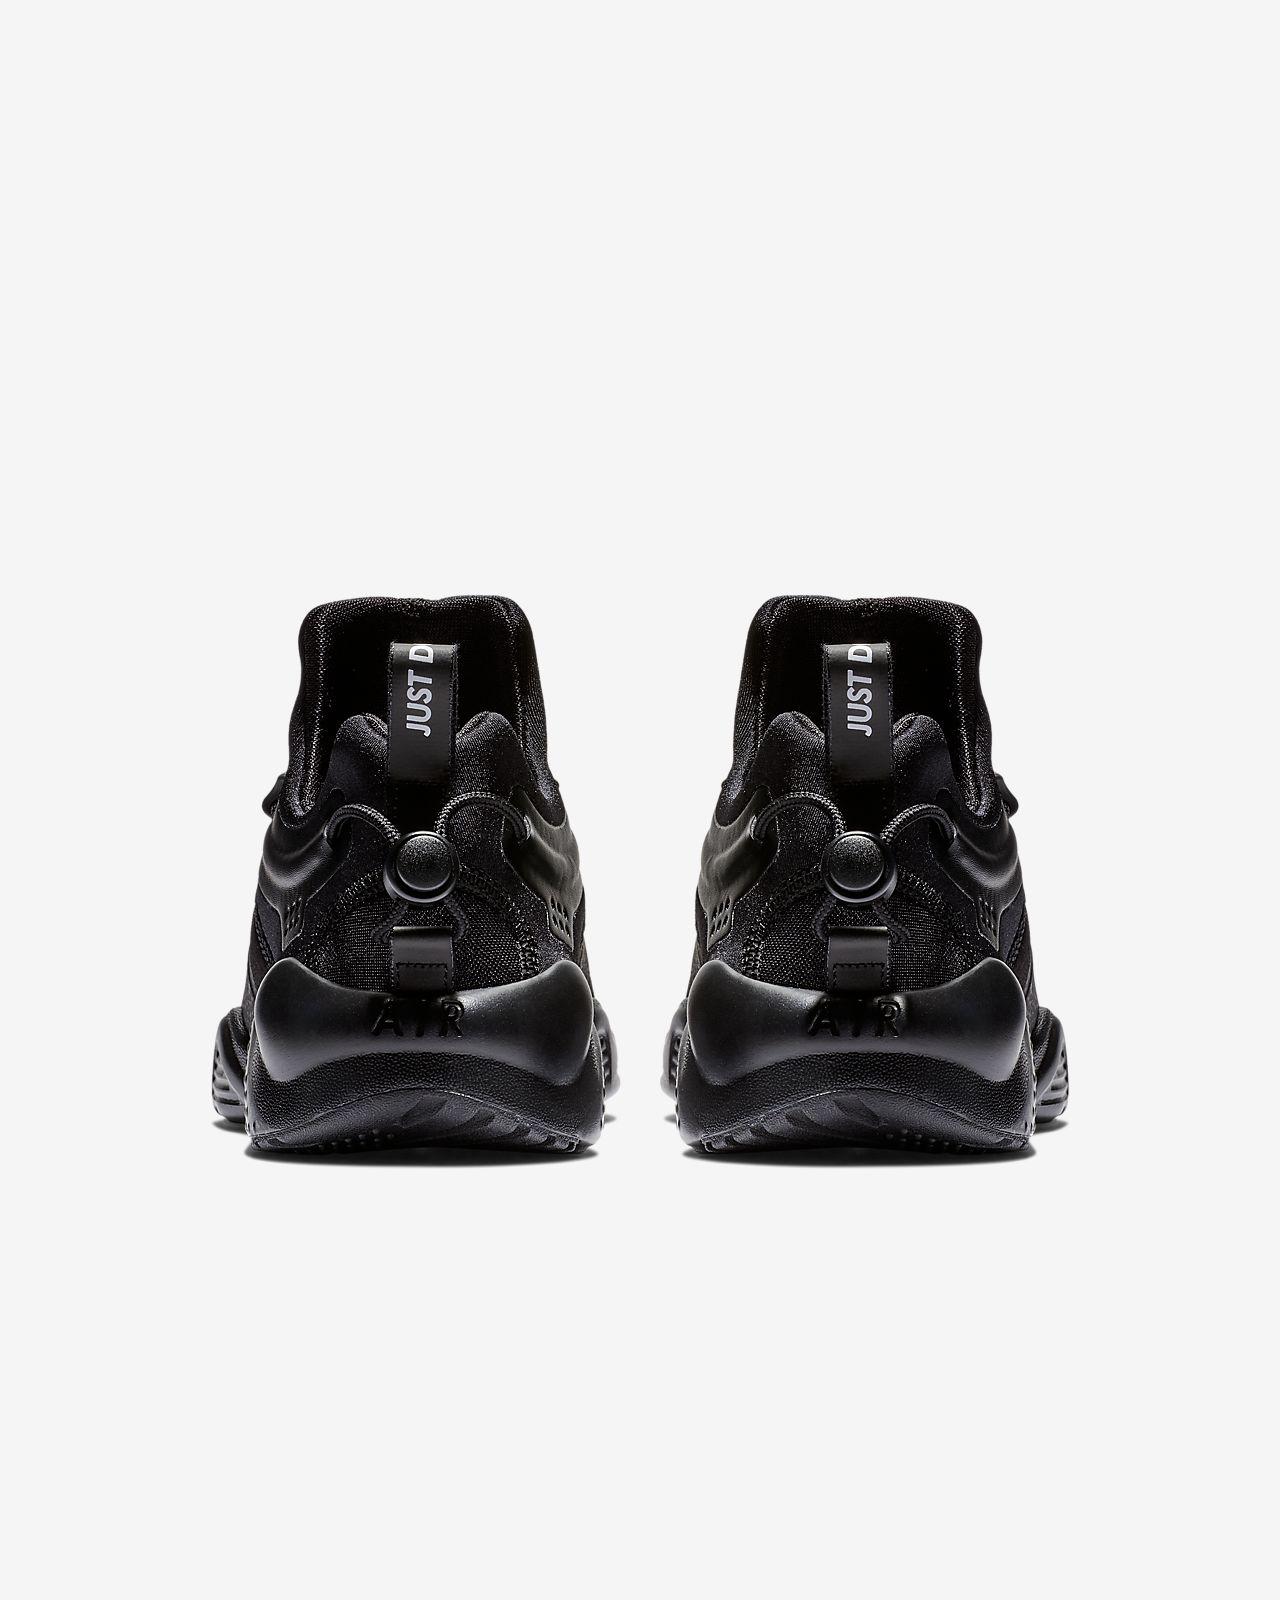 outlet store c2bc6 16e28 ... Nike Air Huarache City Move Women s Shoe